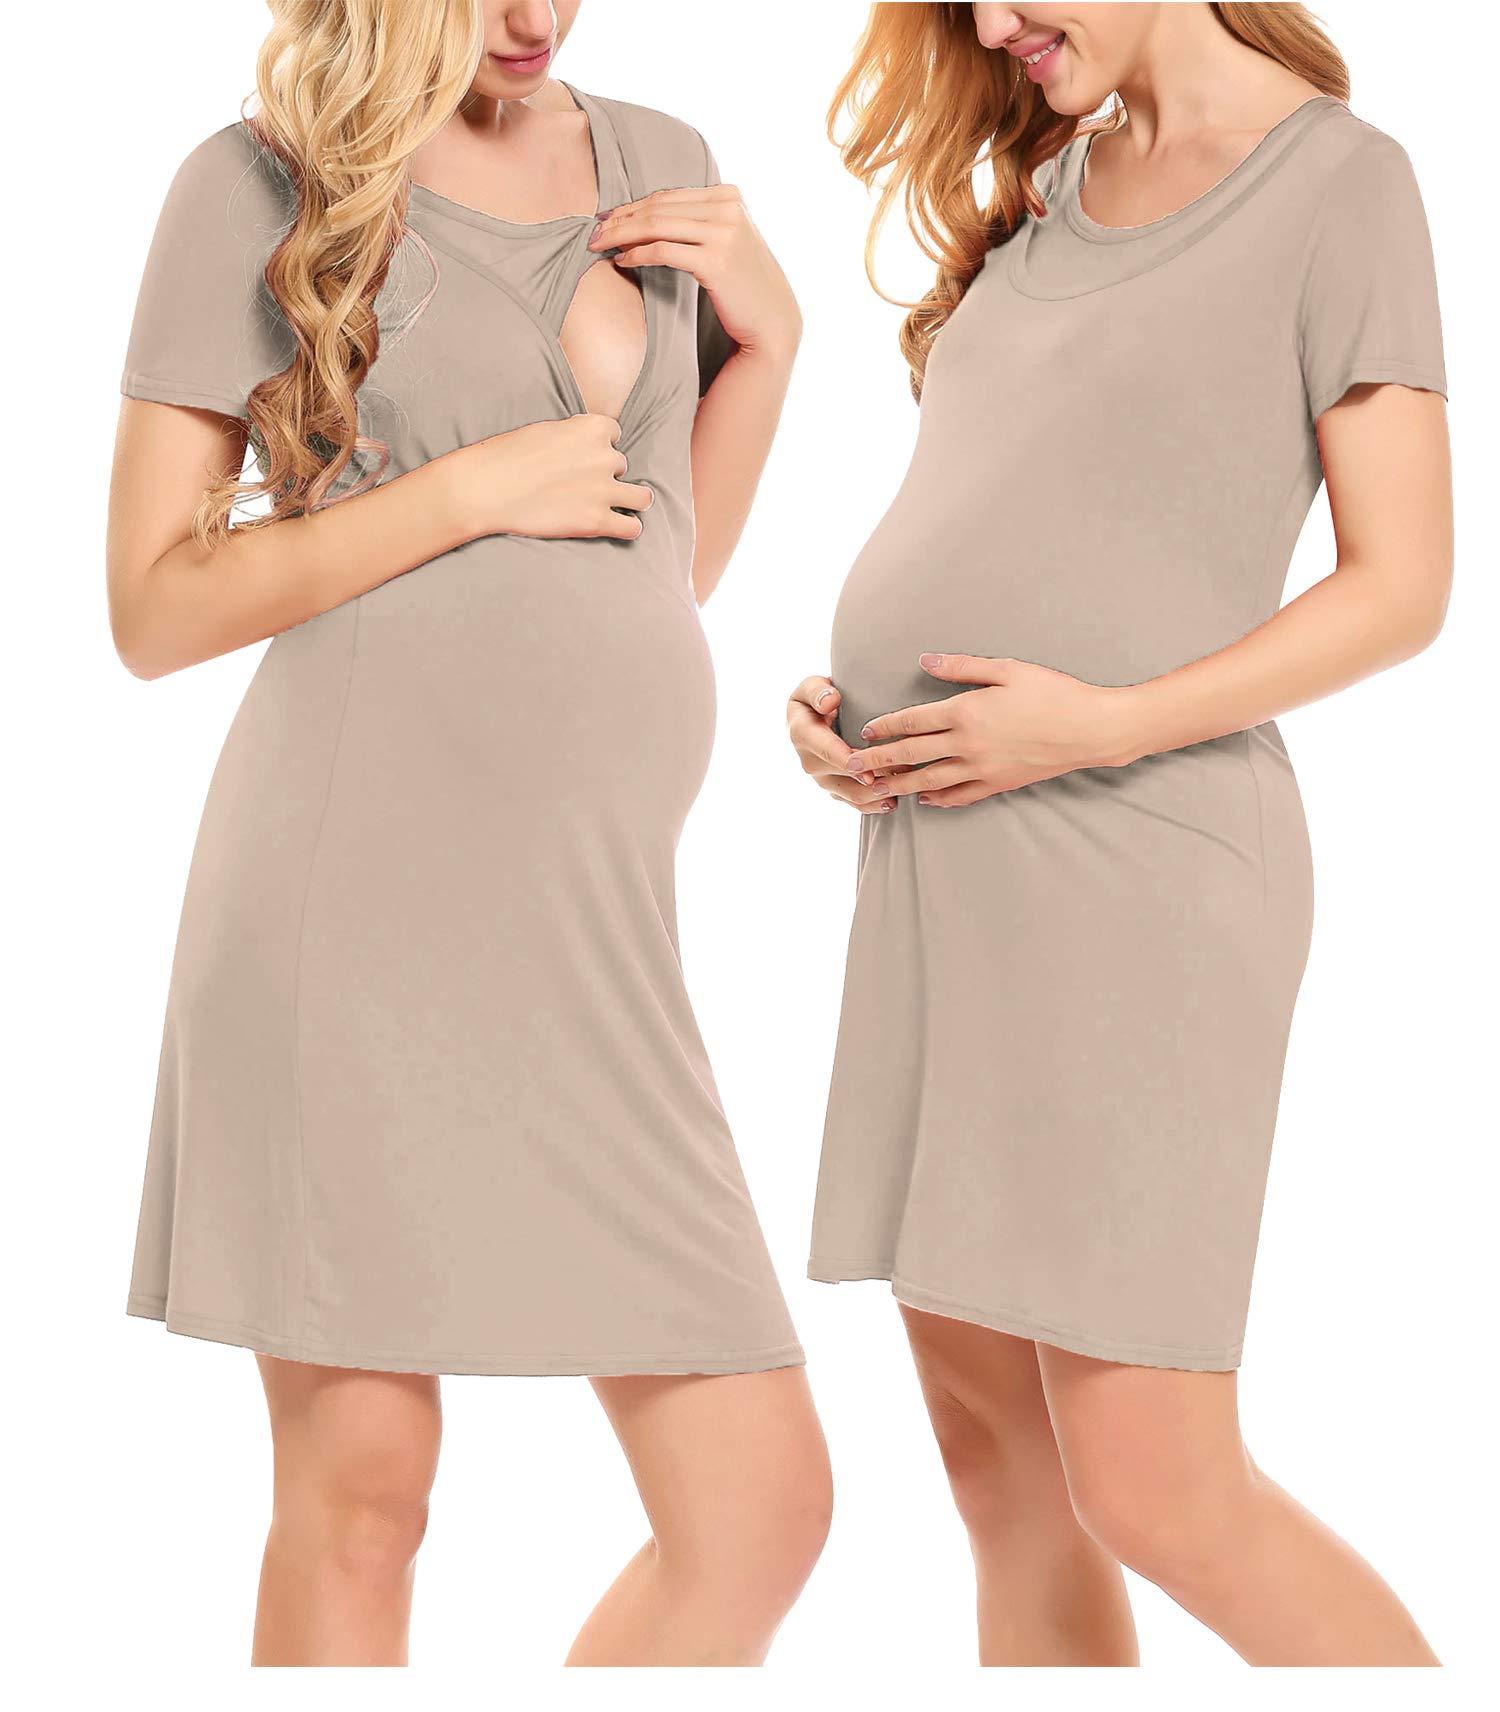 POSHGLAM Womens Nursing Nightgown Maternity Dress Labor//Delivery Hospital Gown//Sleepwear Breastfeeding Nightie